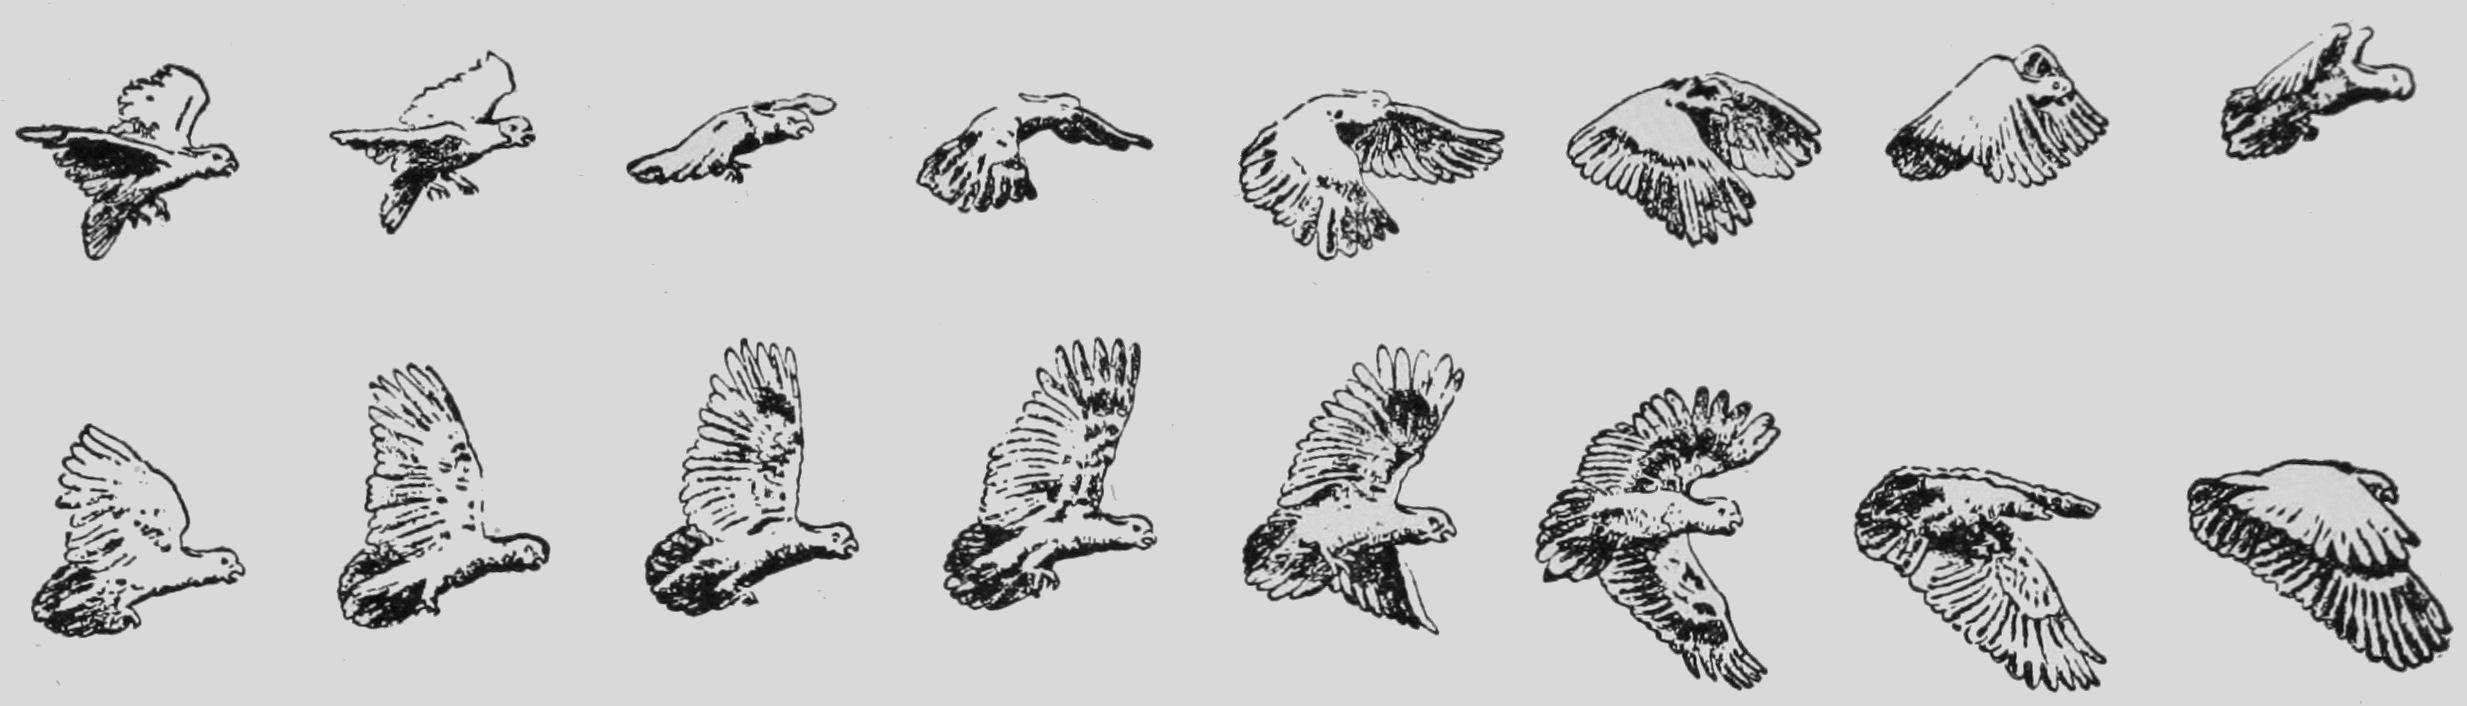 Descriptive Zoopraxography